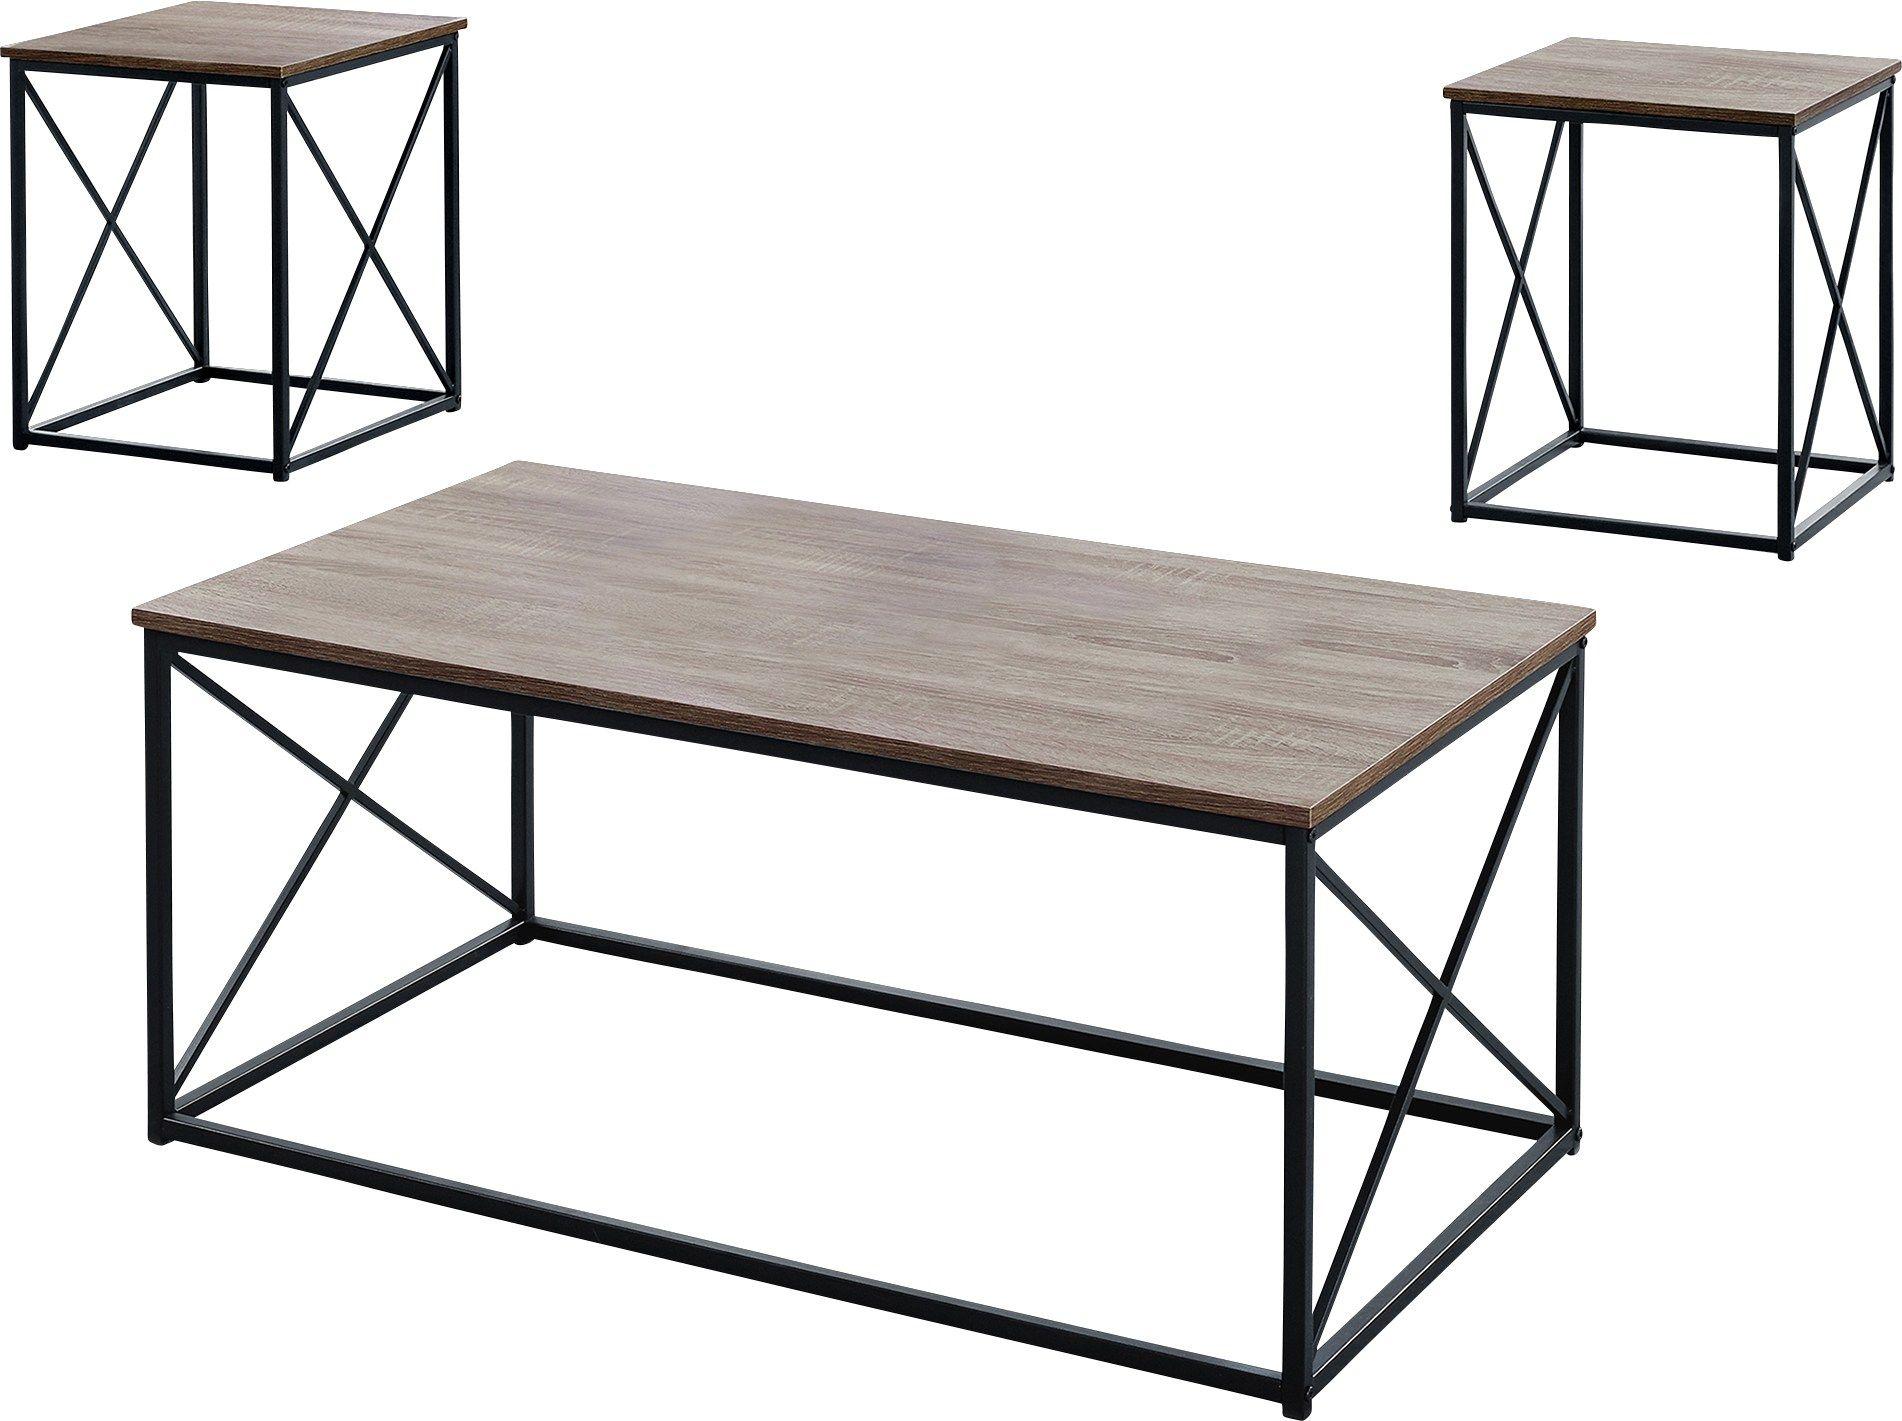 Valburn Taupe 3 Pc Table Set 3 Piece Coffee Table Set Laminate